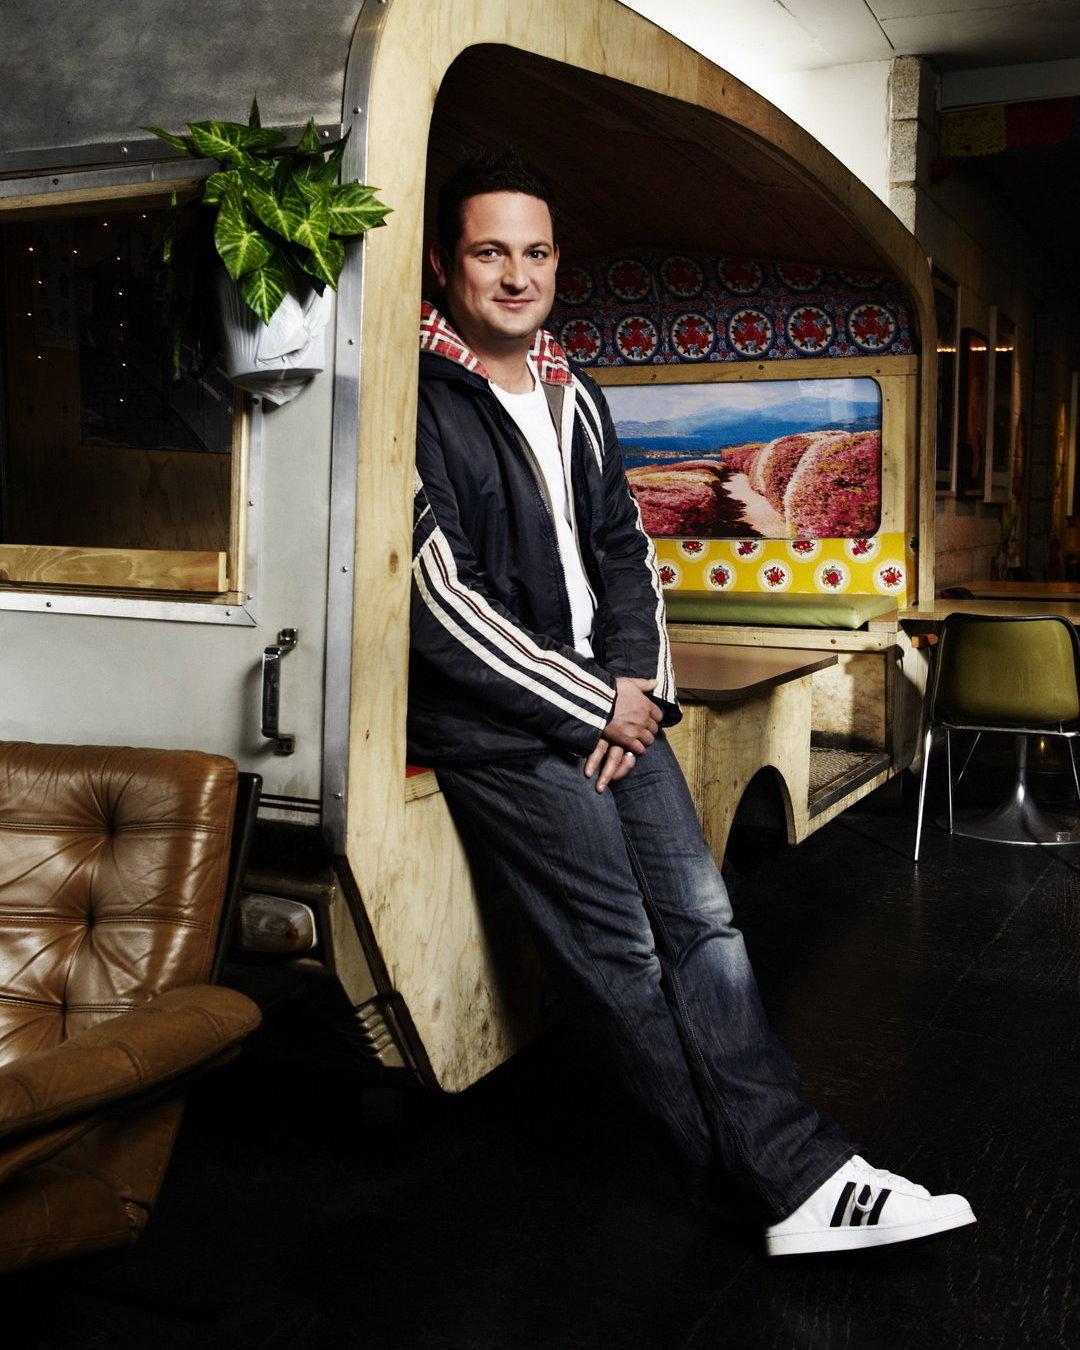 BBC Radio 6 Music Presenter, Chris Hawkins. Photo source: BBC - Photographer: Dean Chalkley